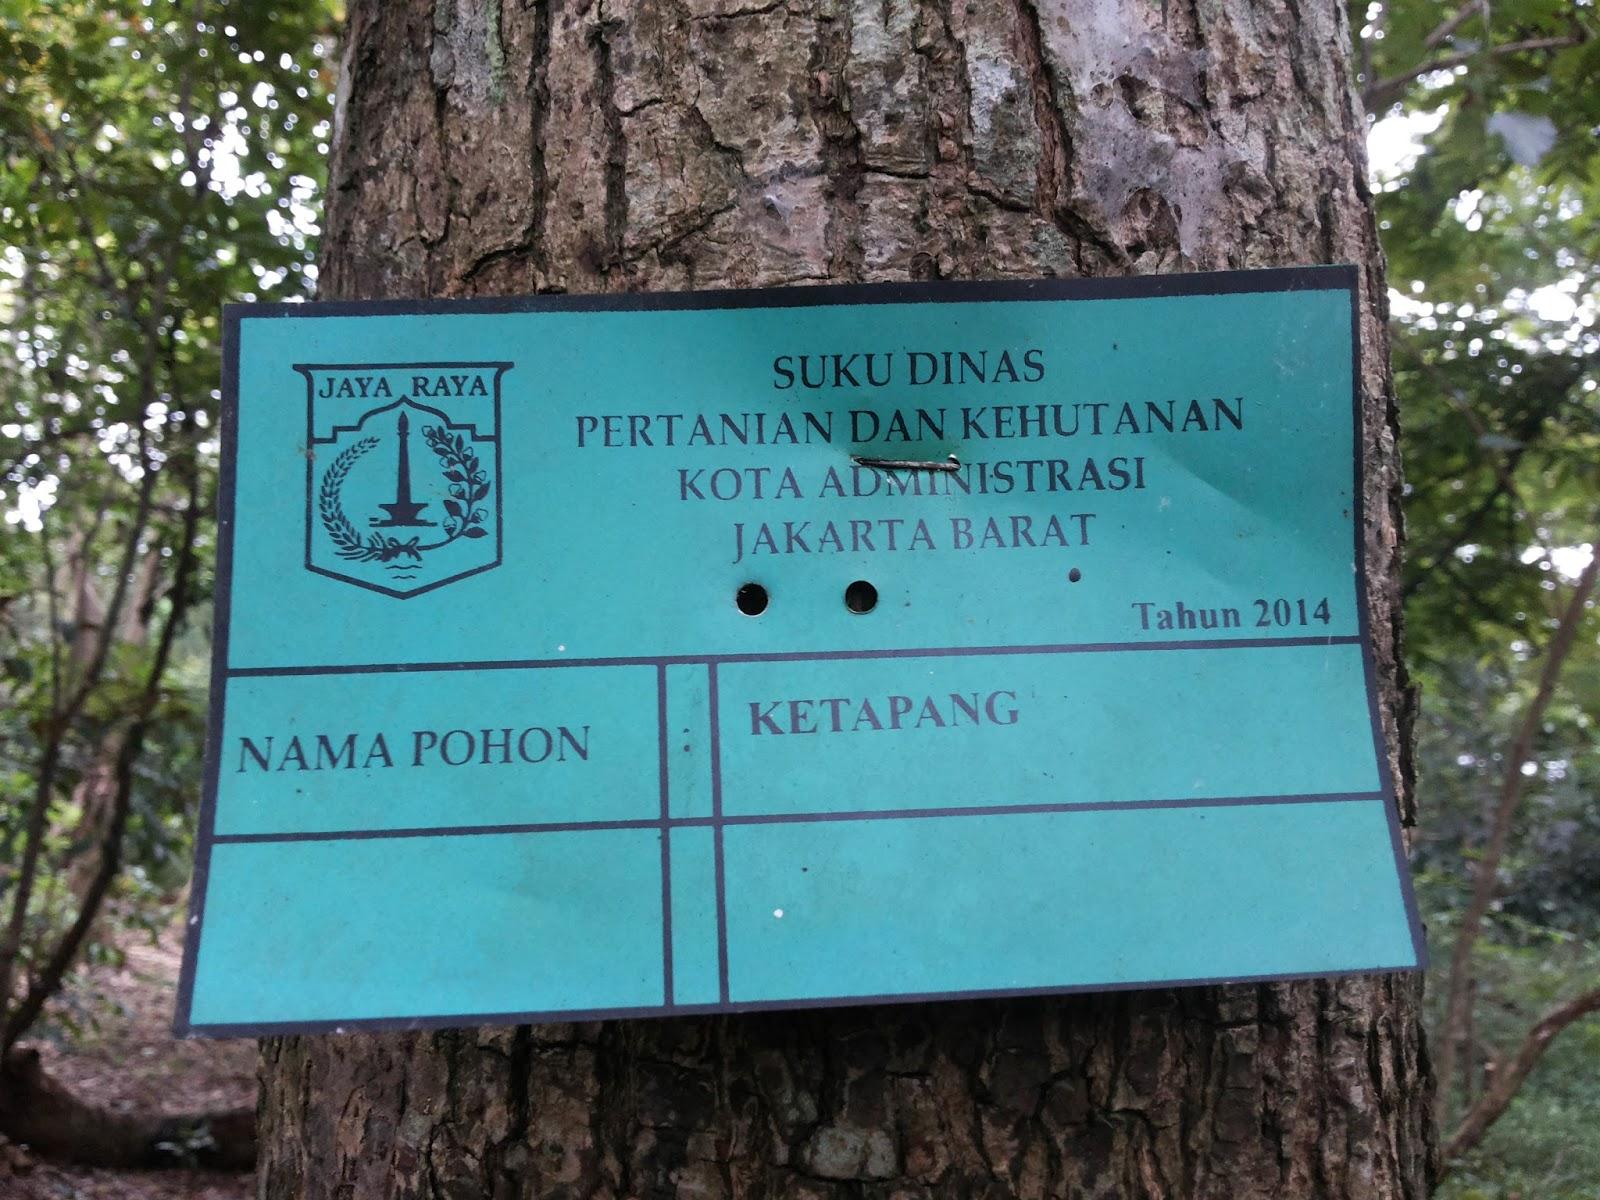 Mandi Oksigen Hutan Kota Srengseng Majalah Betawi Alamat Lengkap Terletak